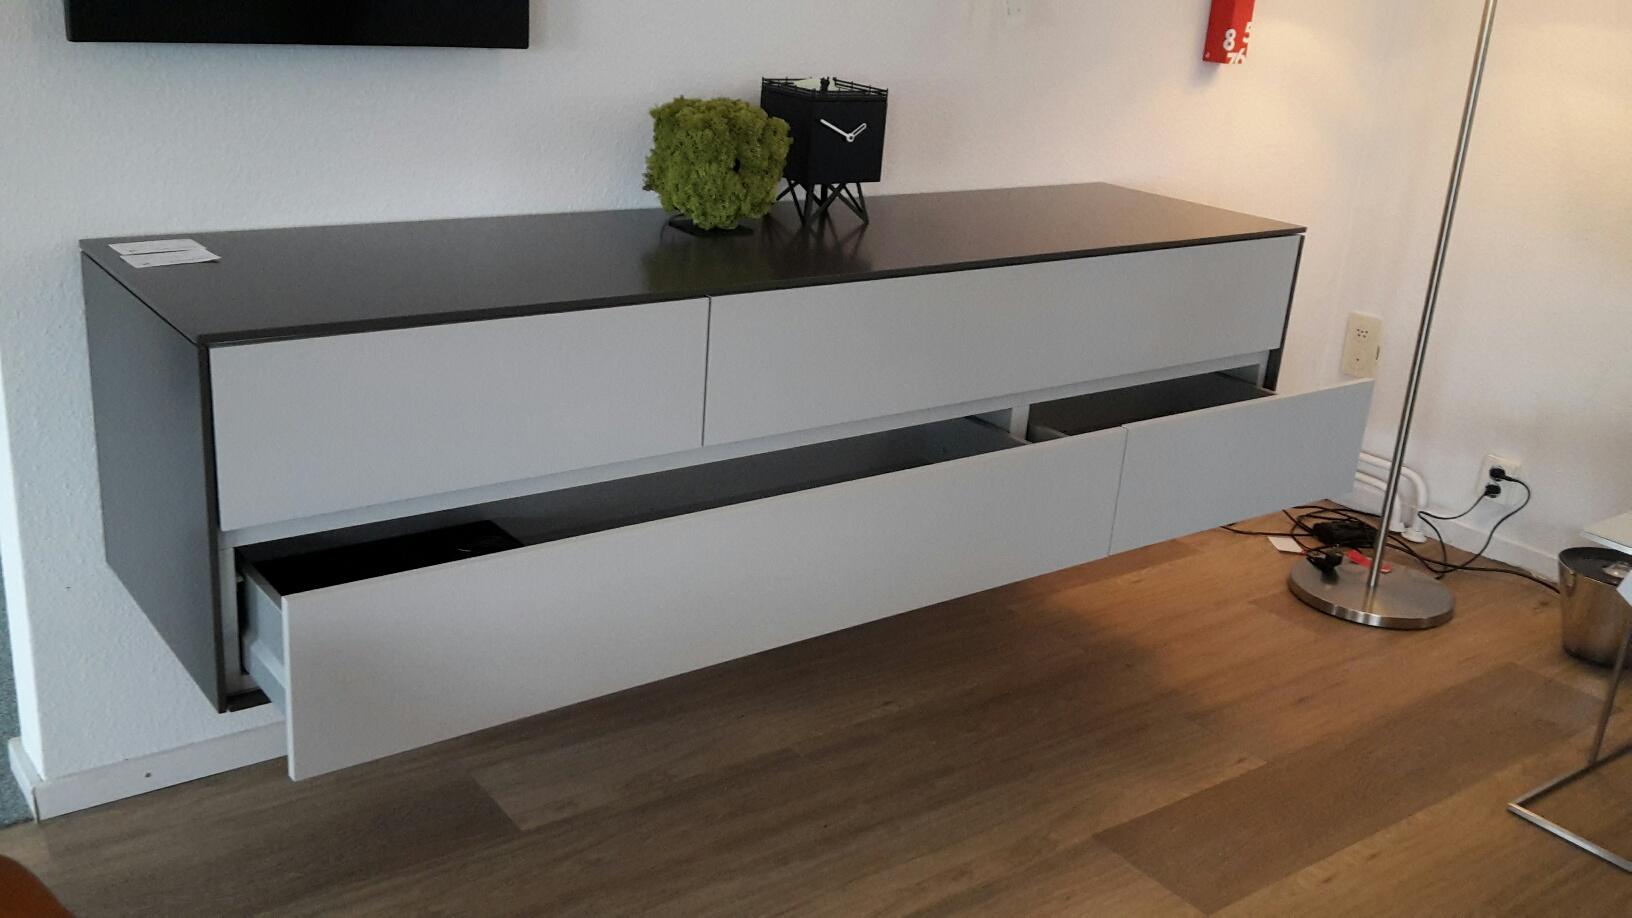 wandkast interl bke model cube fine ploemen interieur. Black Bedroom Furniture Sets. Home Design Ideas